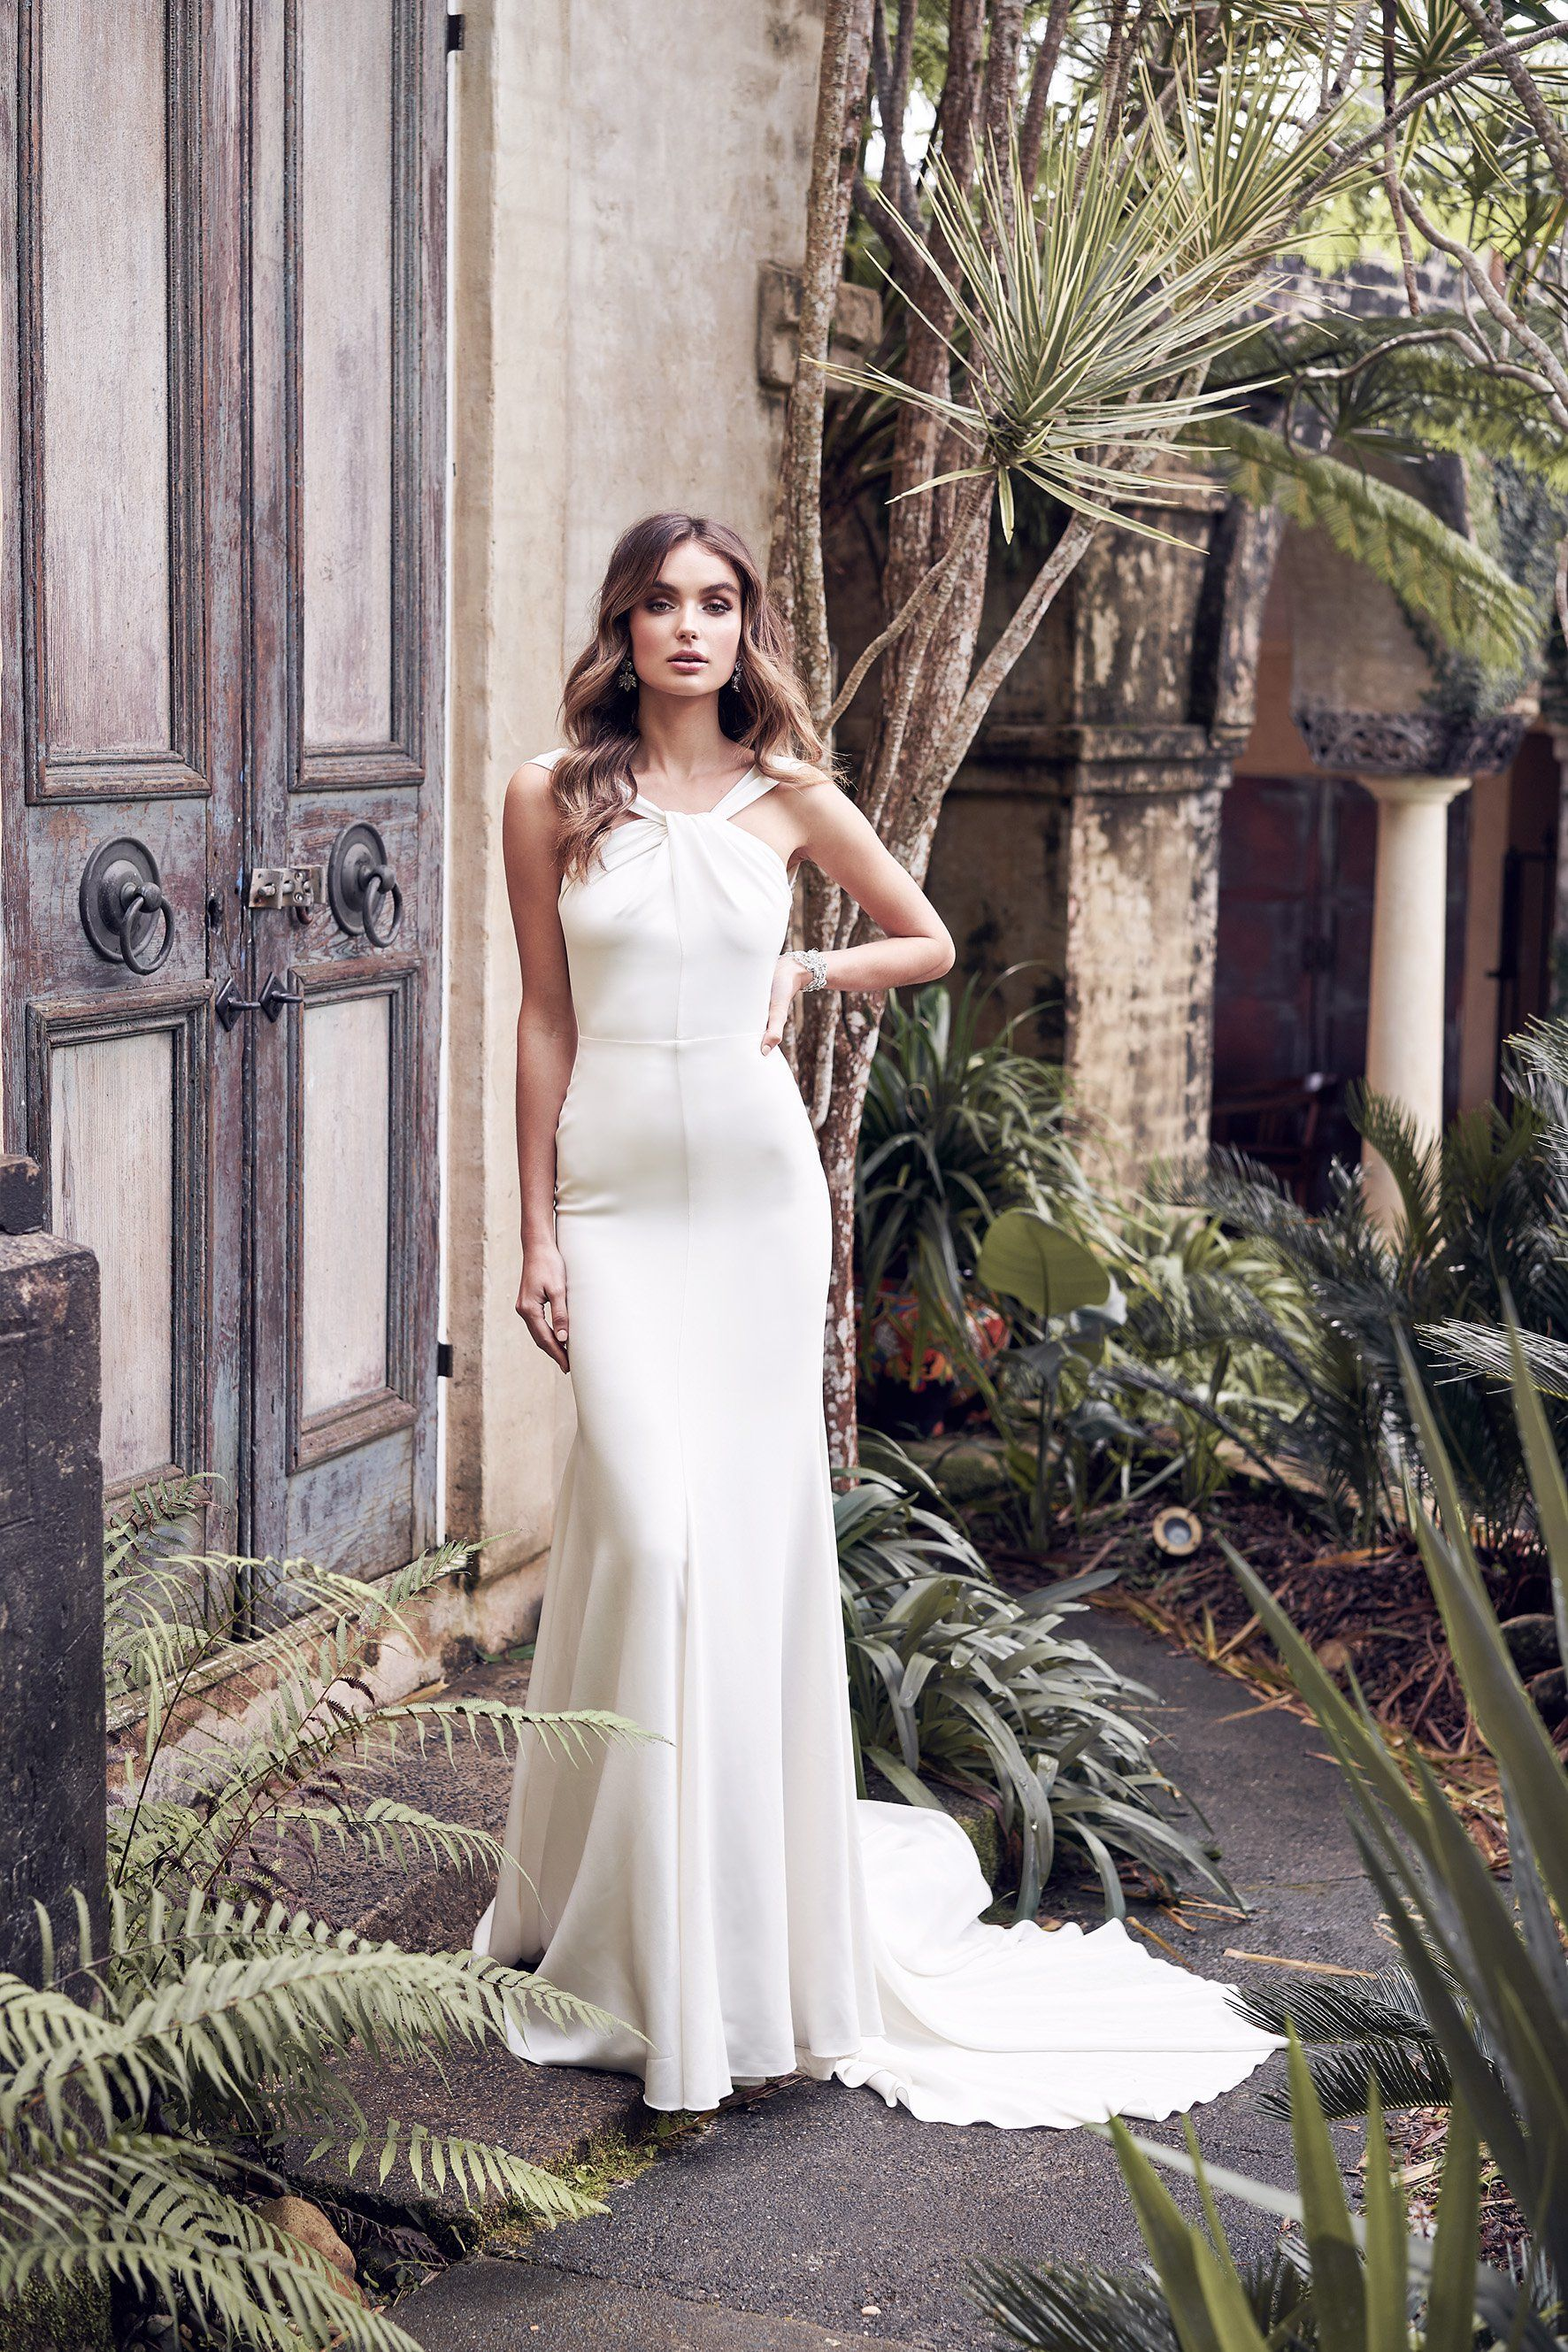 Anna campbell wanderlust wedding realwedding realbride bride